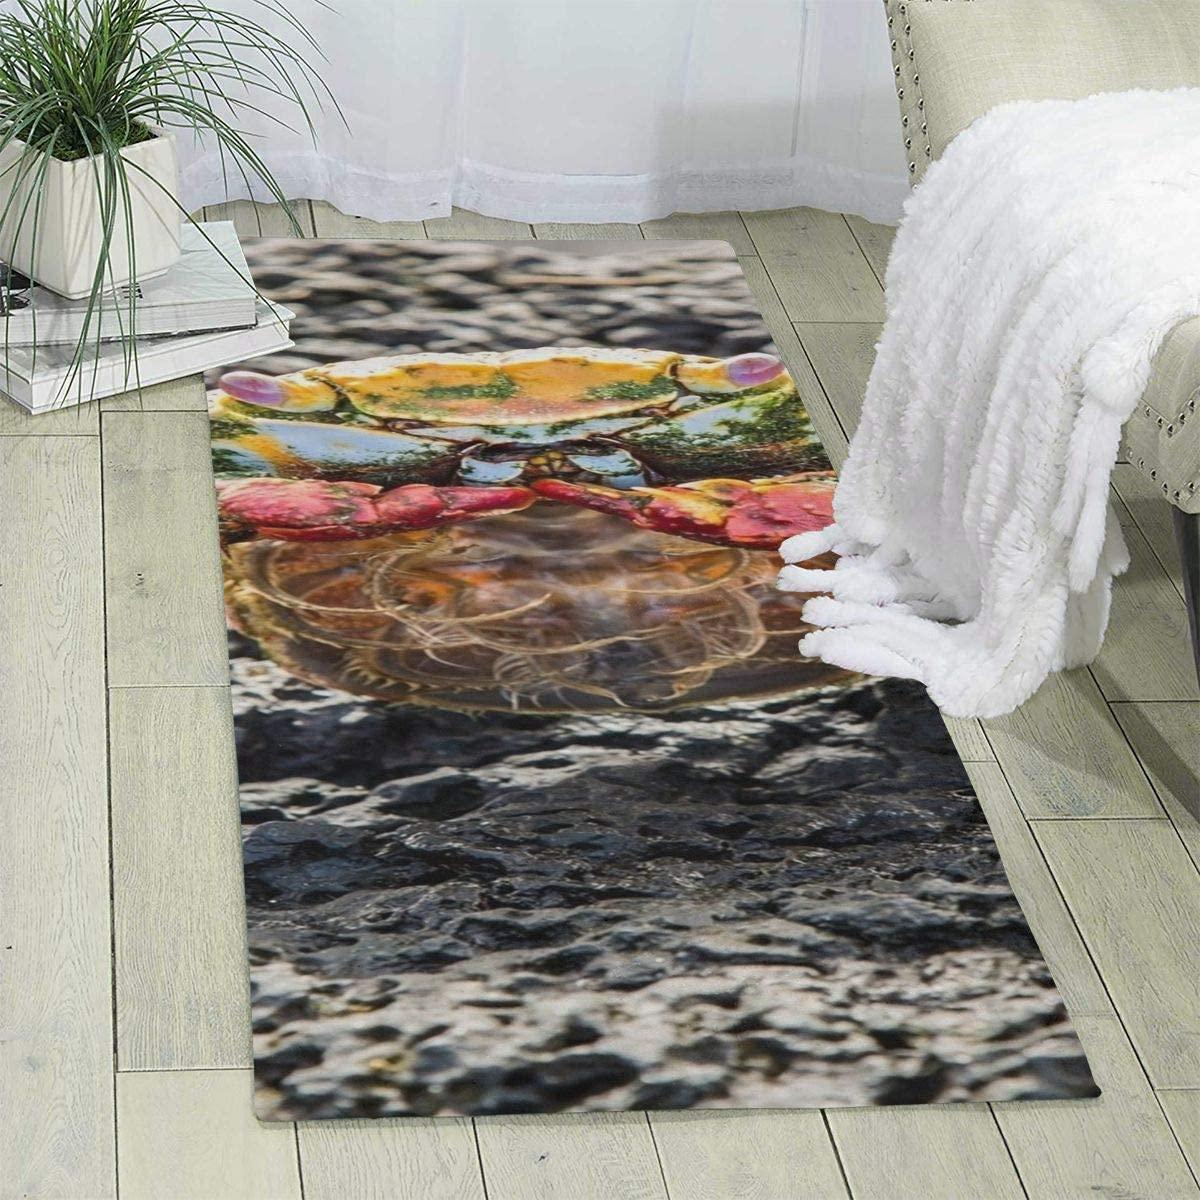 Pooizsdzzz Carpet 70 X 24 X 6mm Stone Red Crab Modern Area Rug for Bedroom Living Room Floor Home Decor